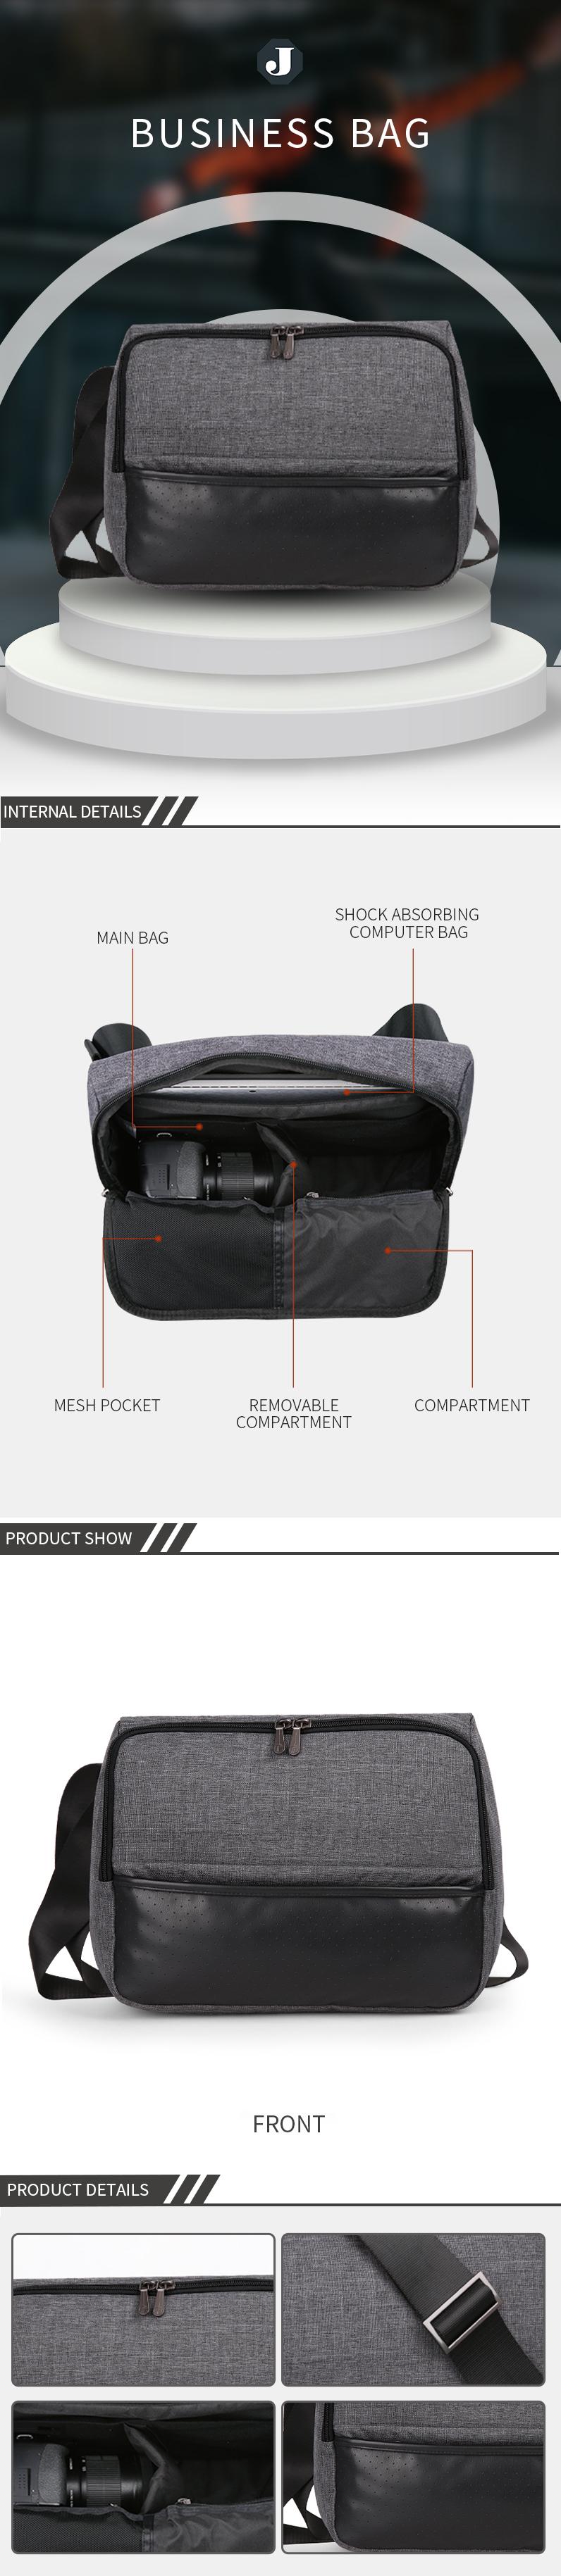 business bag-004M.jpg